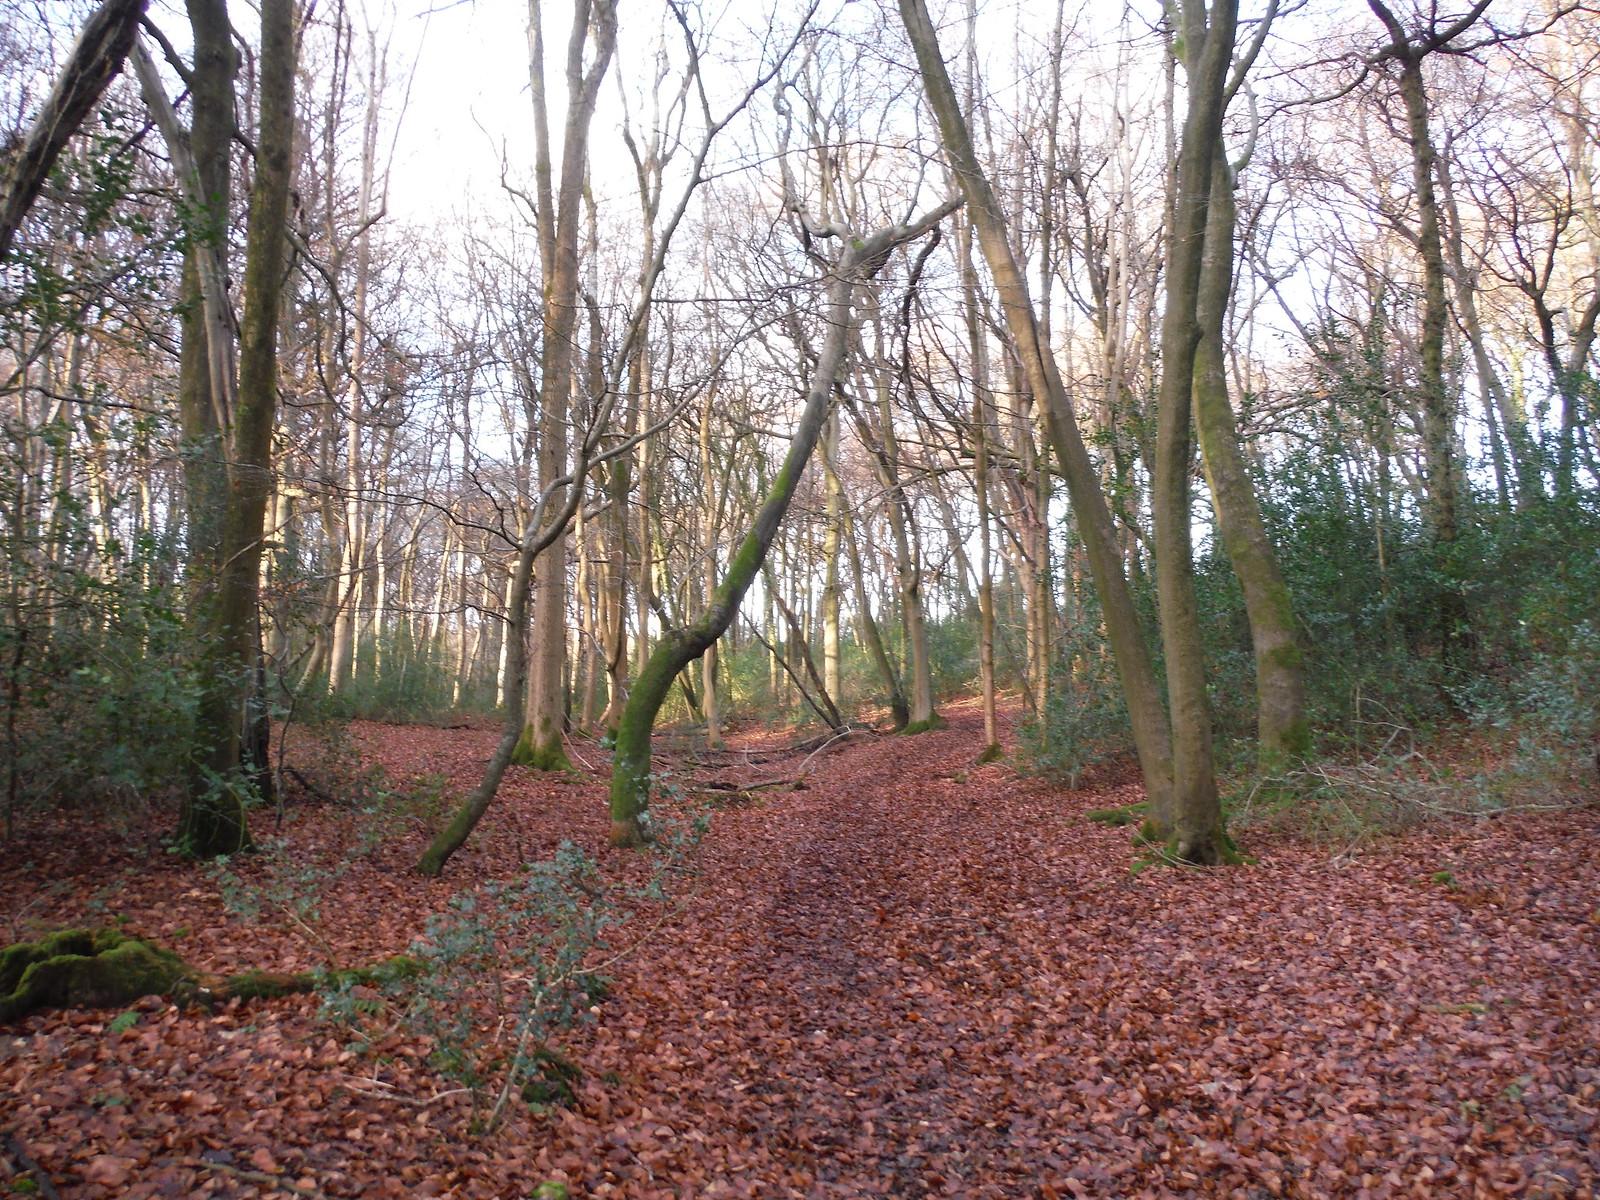 Wintry scene in Lownde's Wood SWC Walk 140a Wendover to Great Missenden